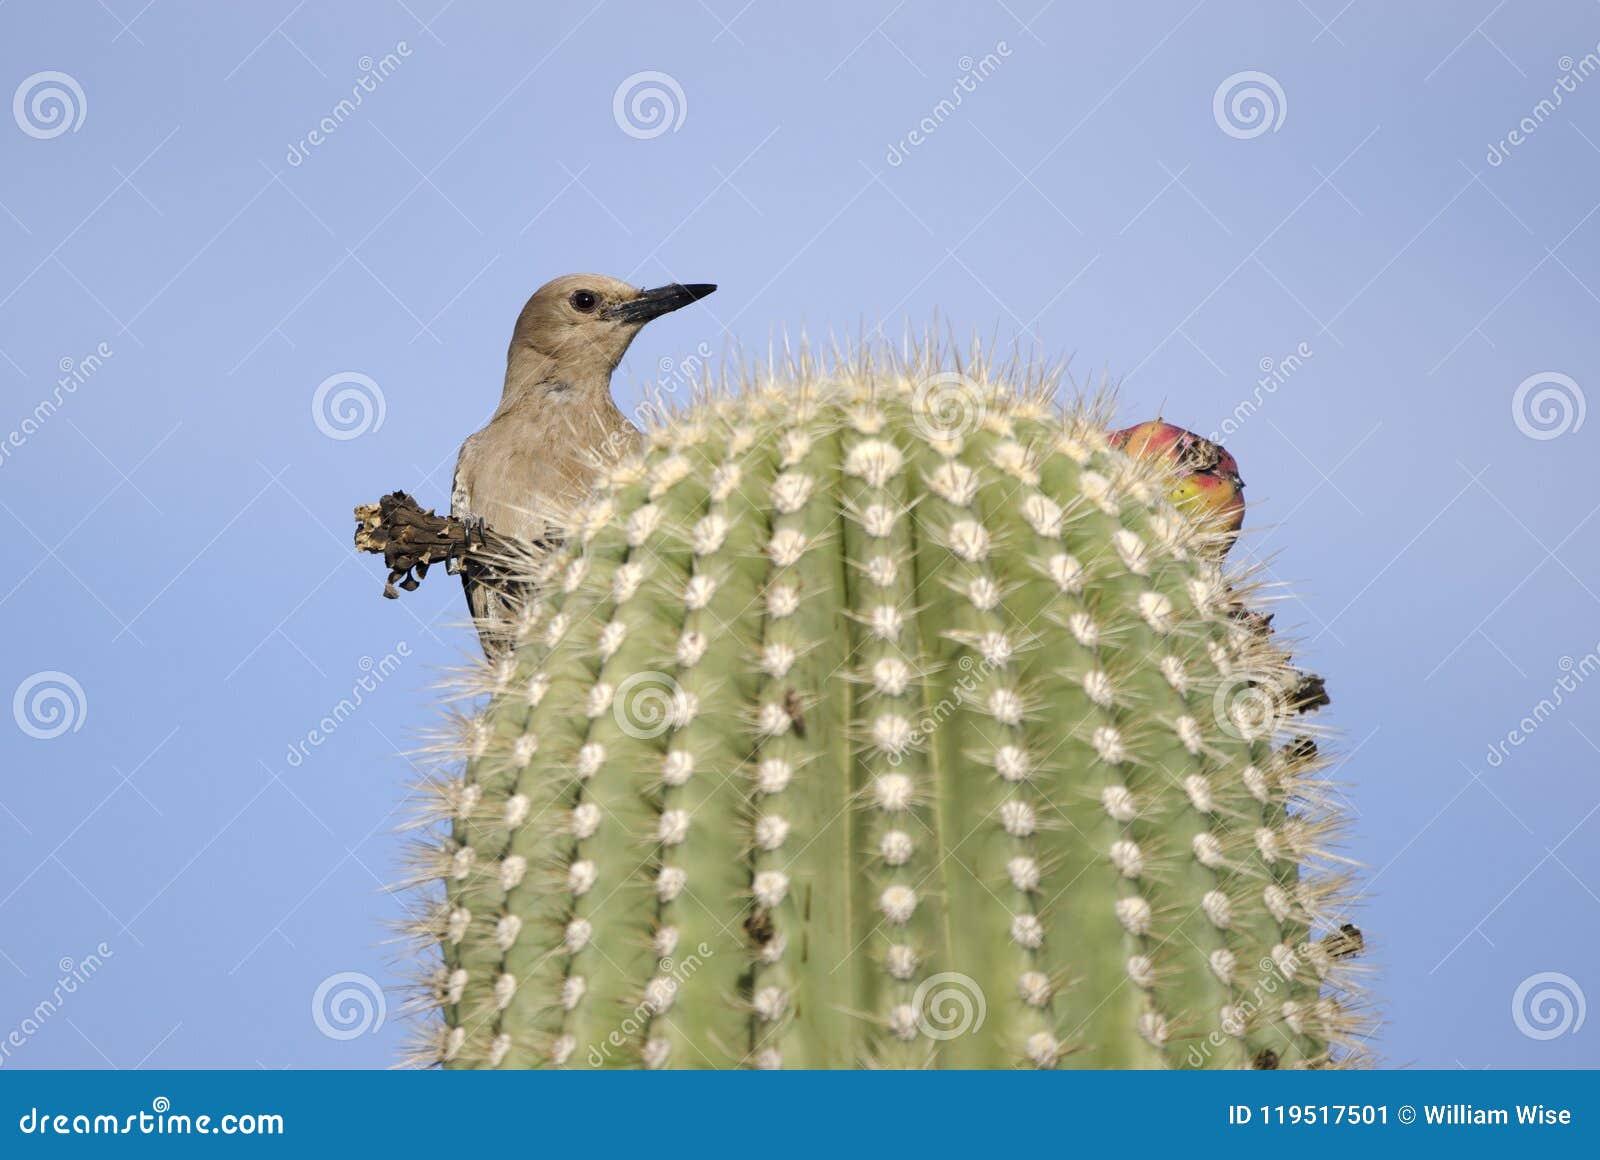 Gila Woodpecker on Saguaro Cactus, Tucson Arizona desert